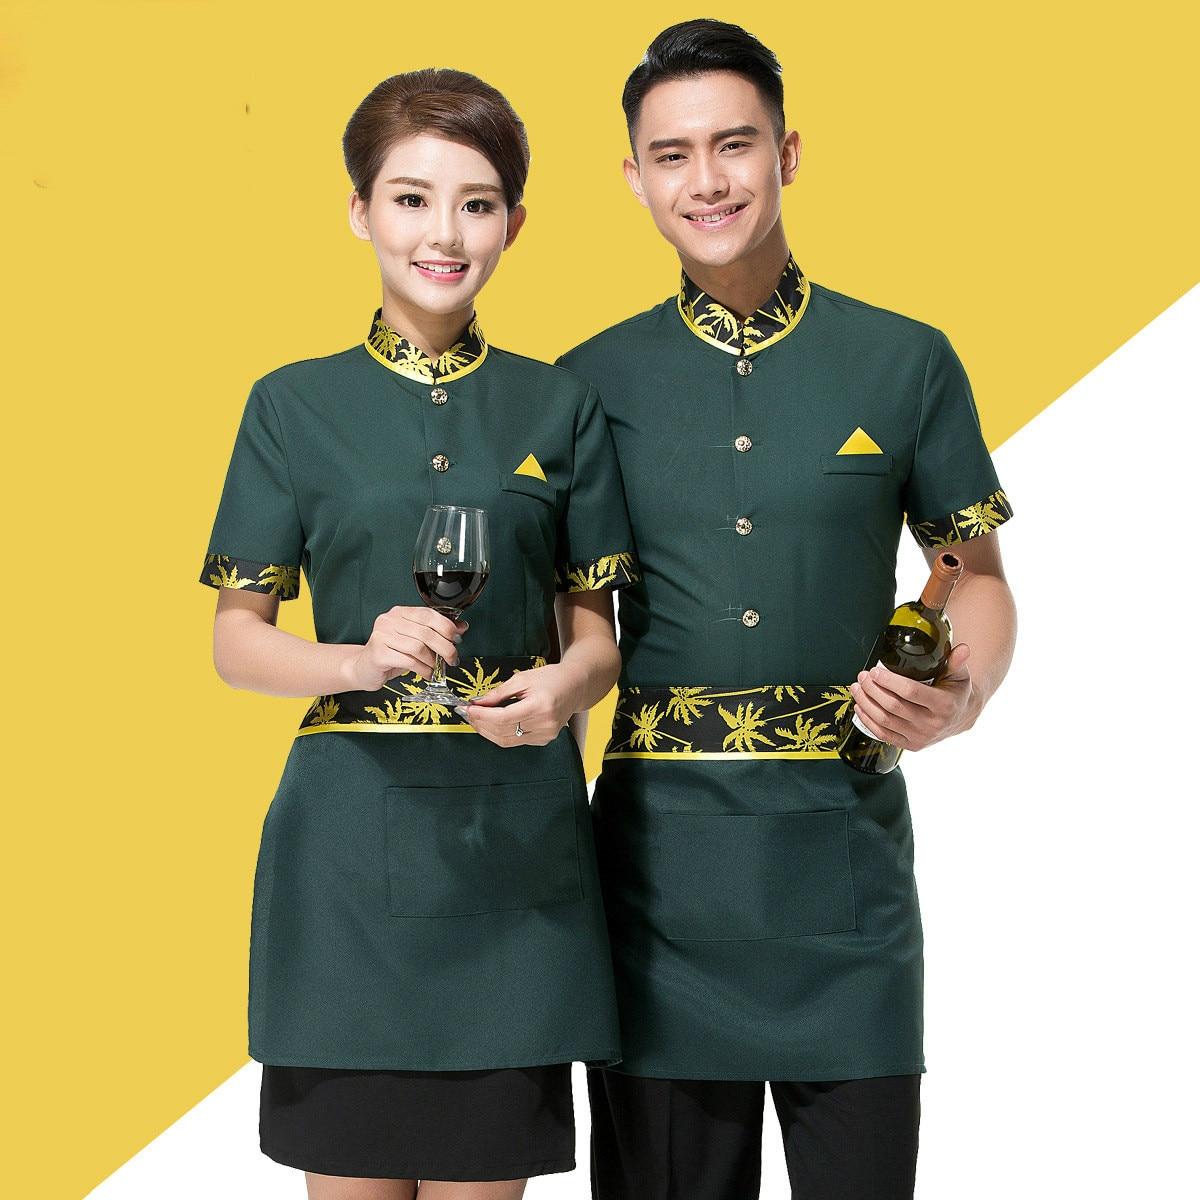 Service Uniforms verity  Models of Uniforms In  Texworld  Ernakulam